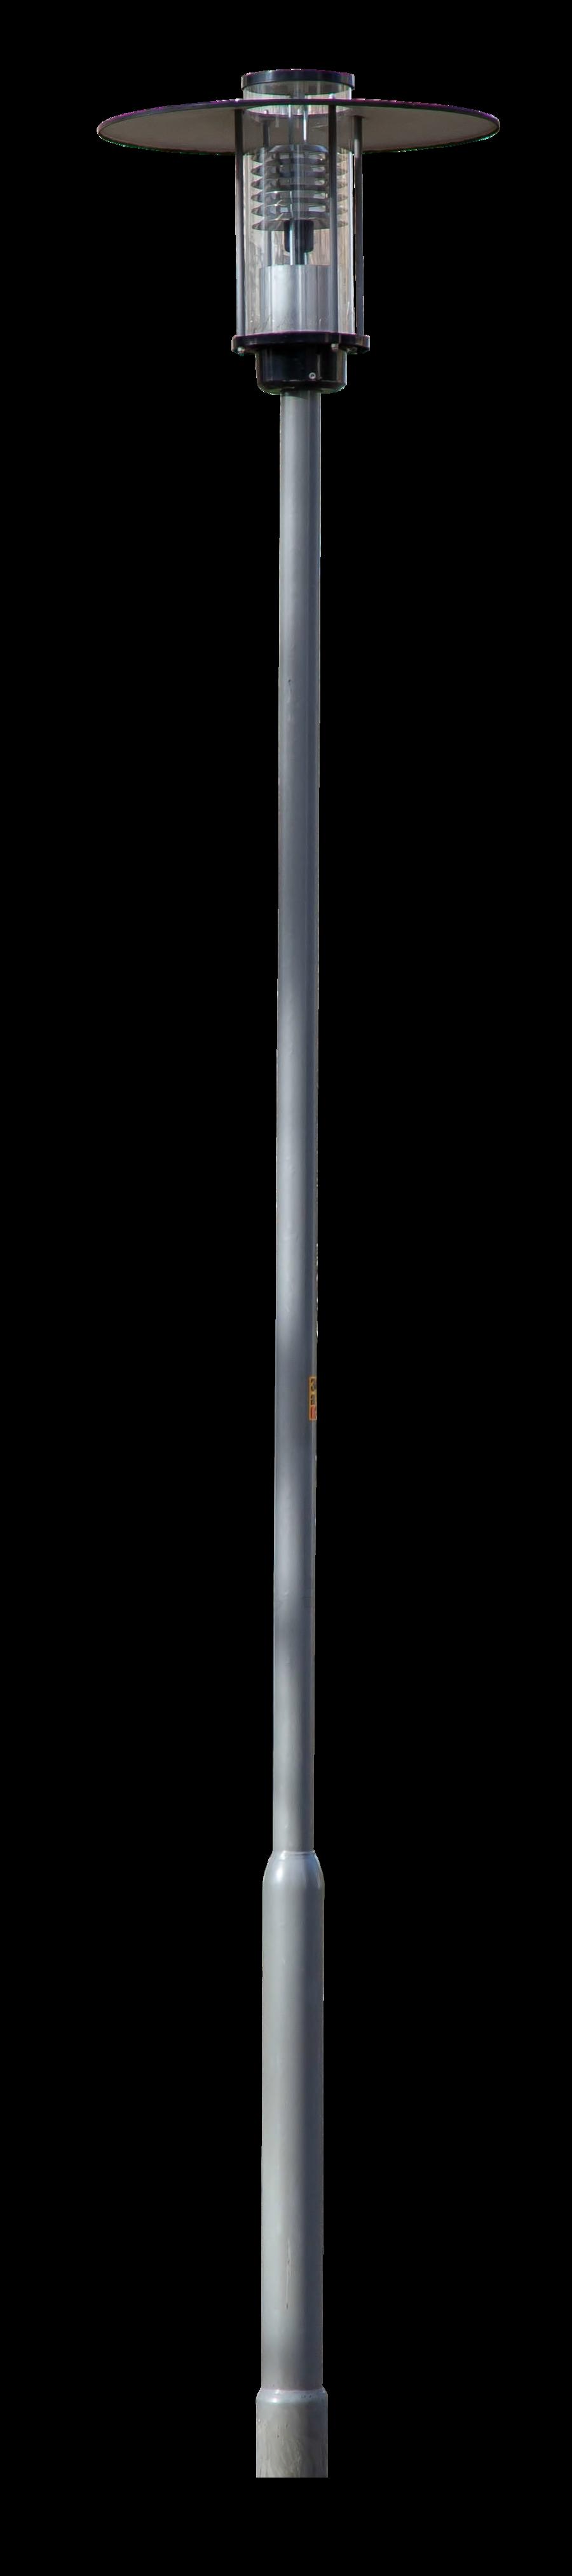 Street Light Street light, Light, Night lamps